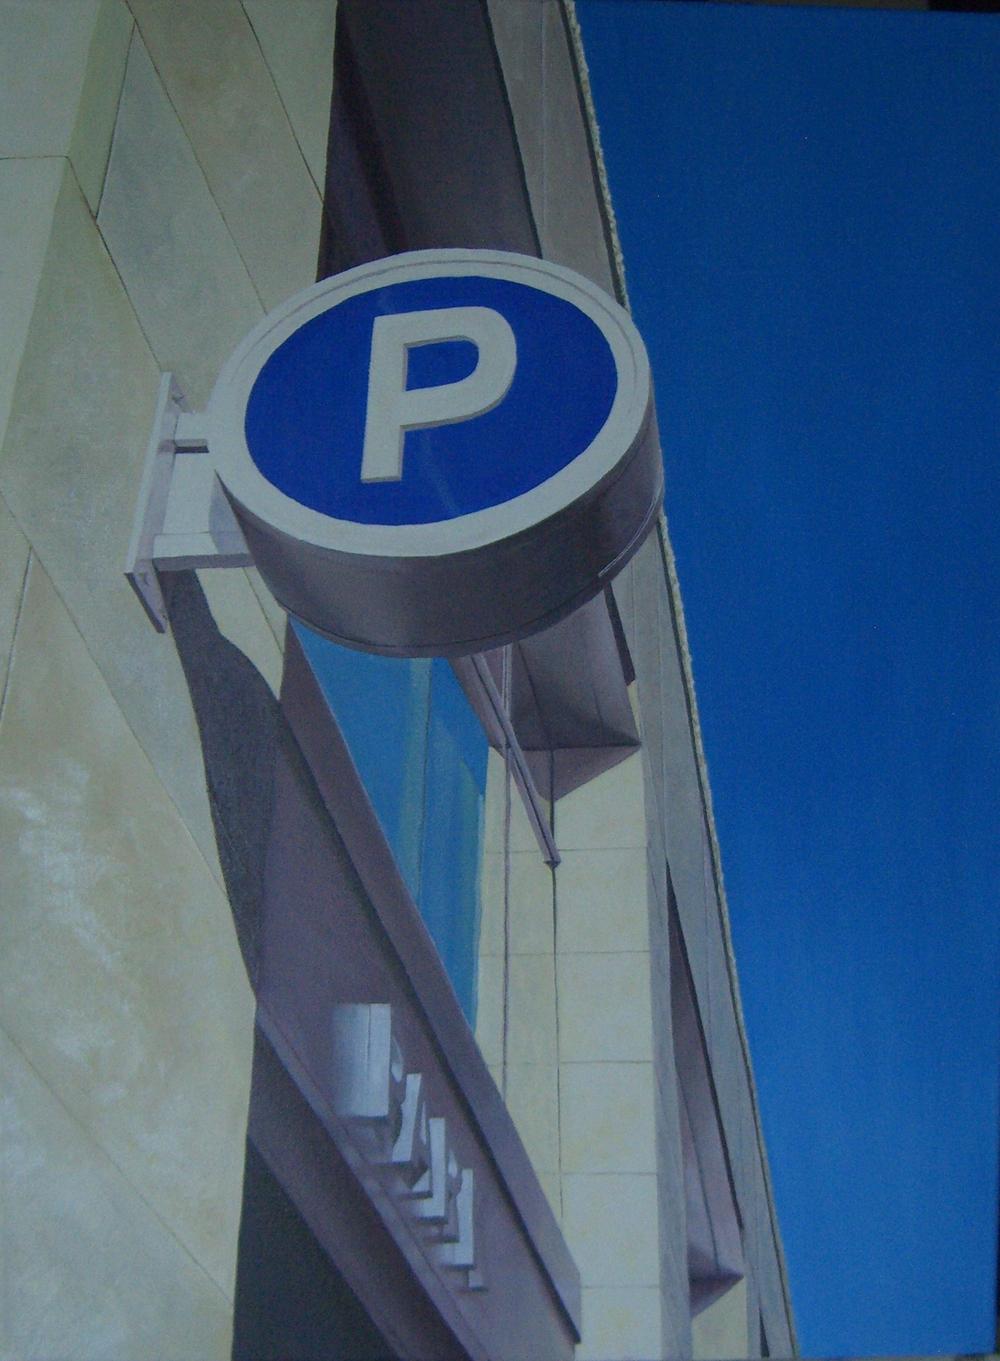 President Street Parking